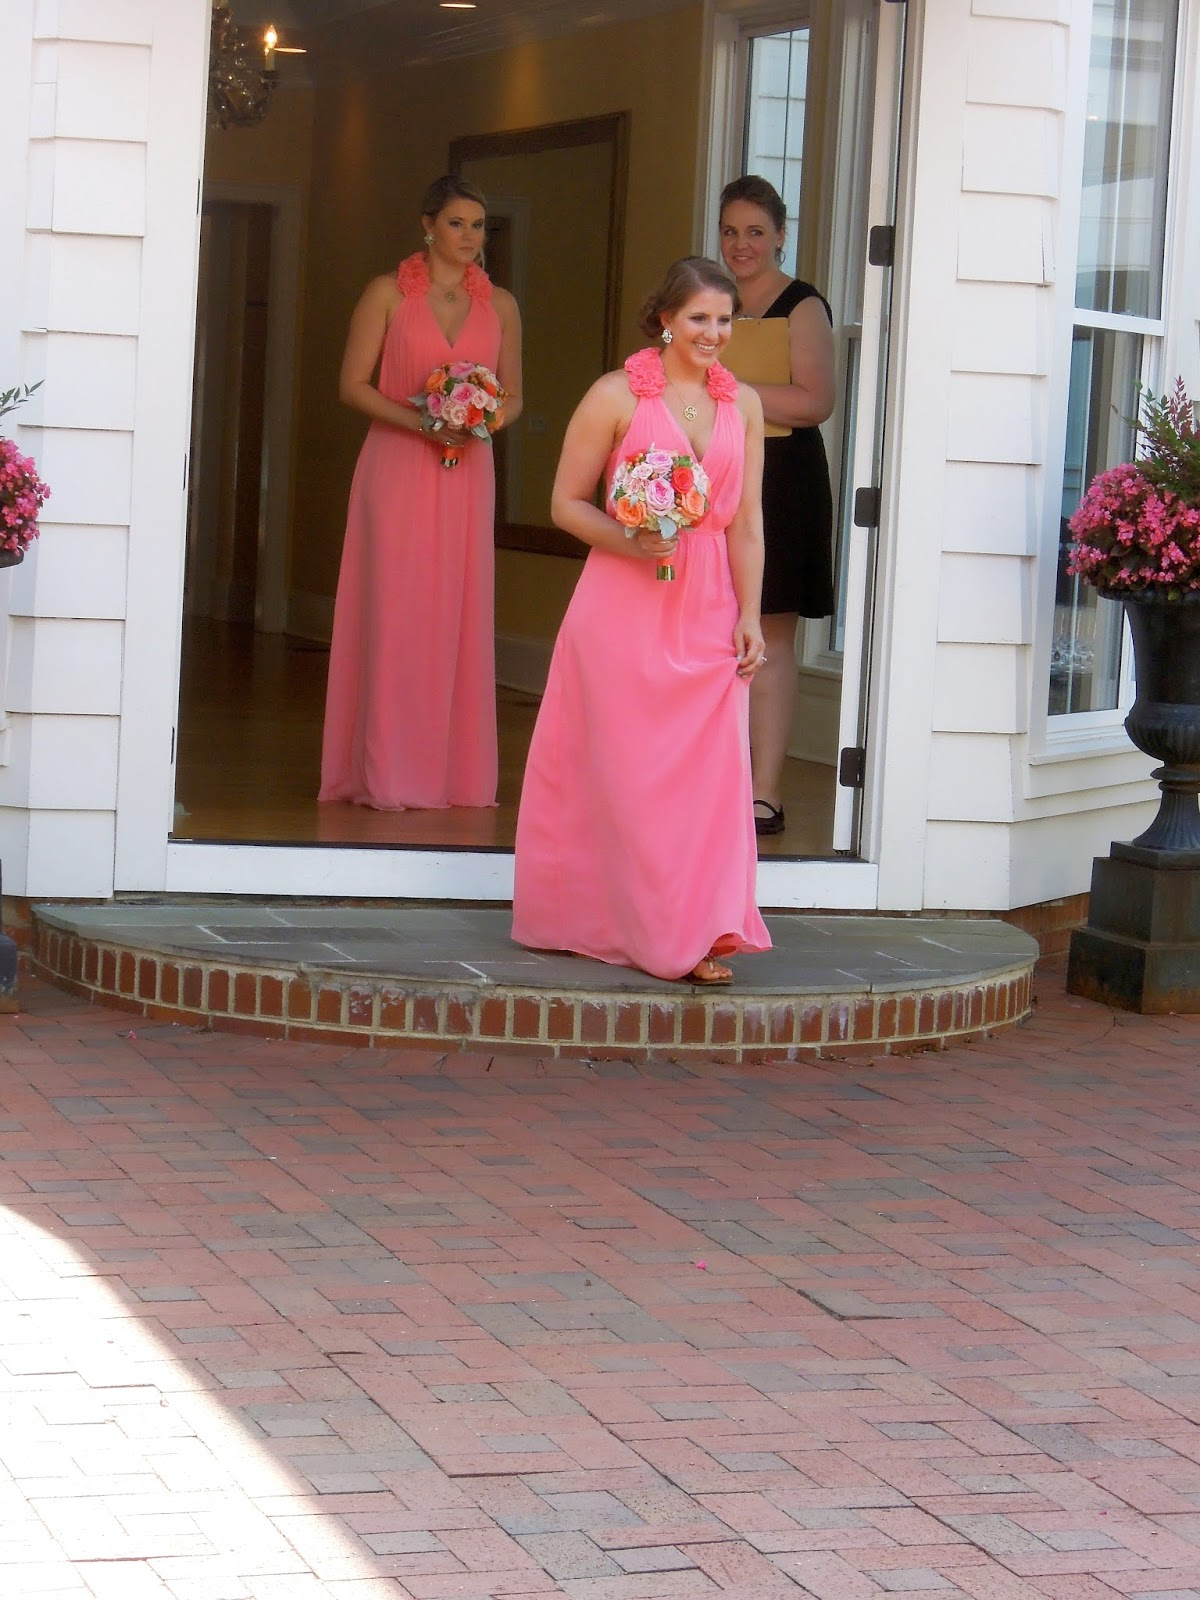 Raleigh Wedding Blog: June 2014